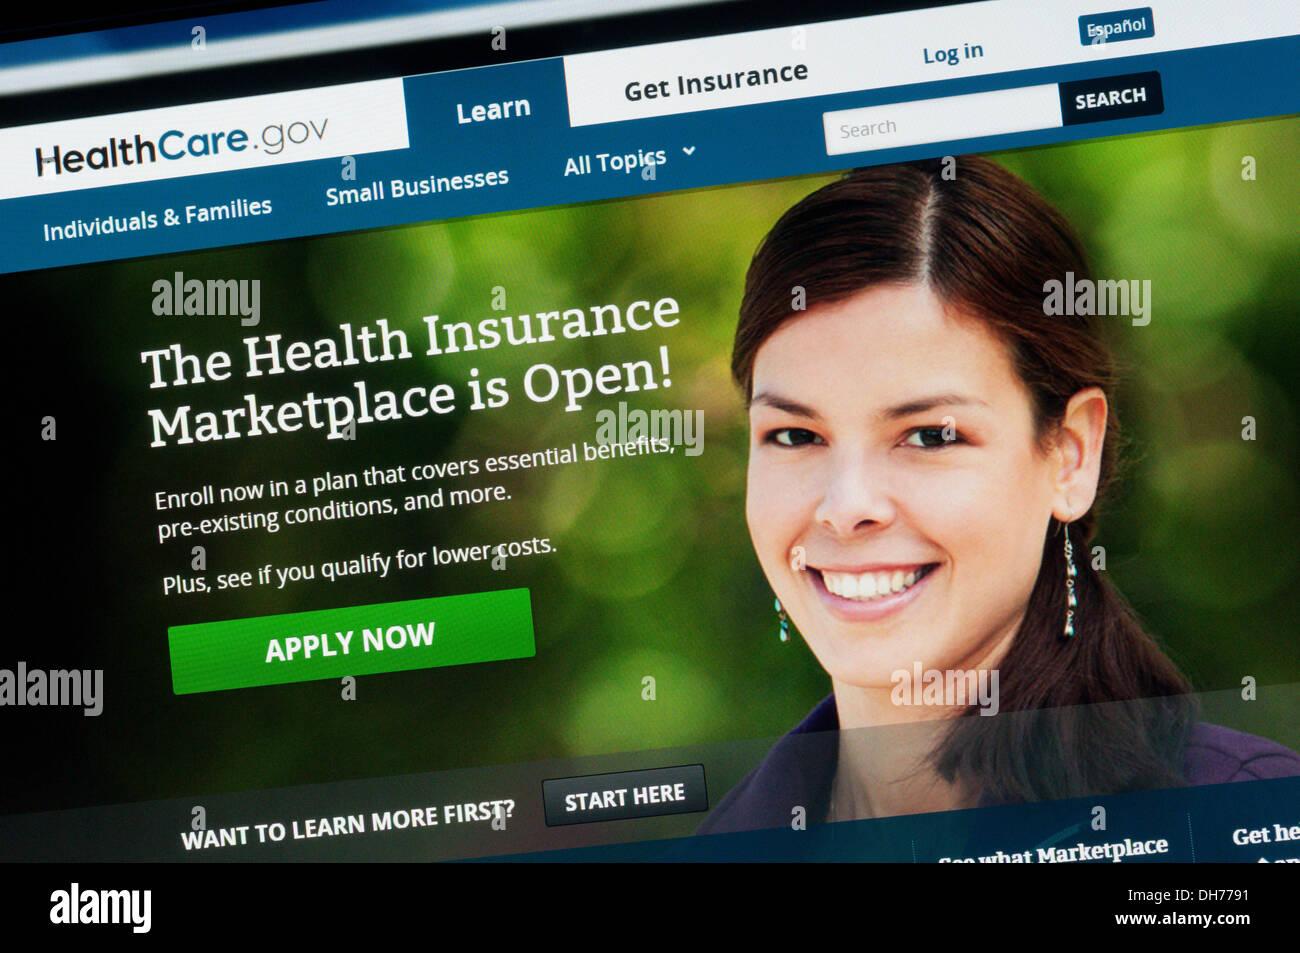 American health insurance website. - Stock Image